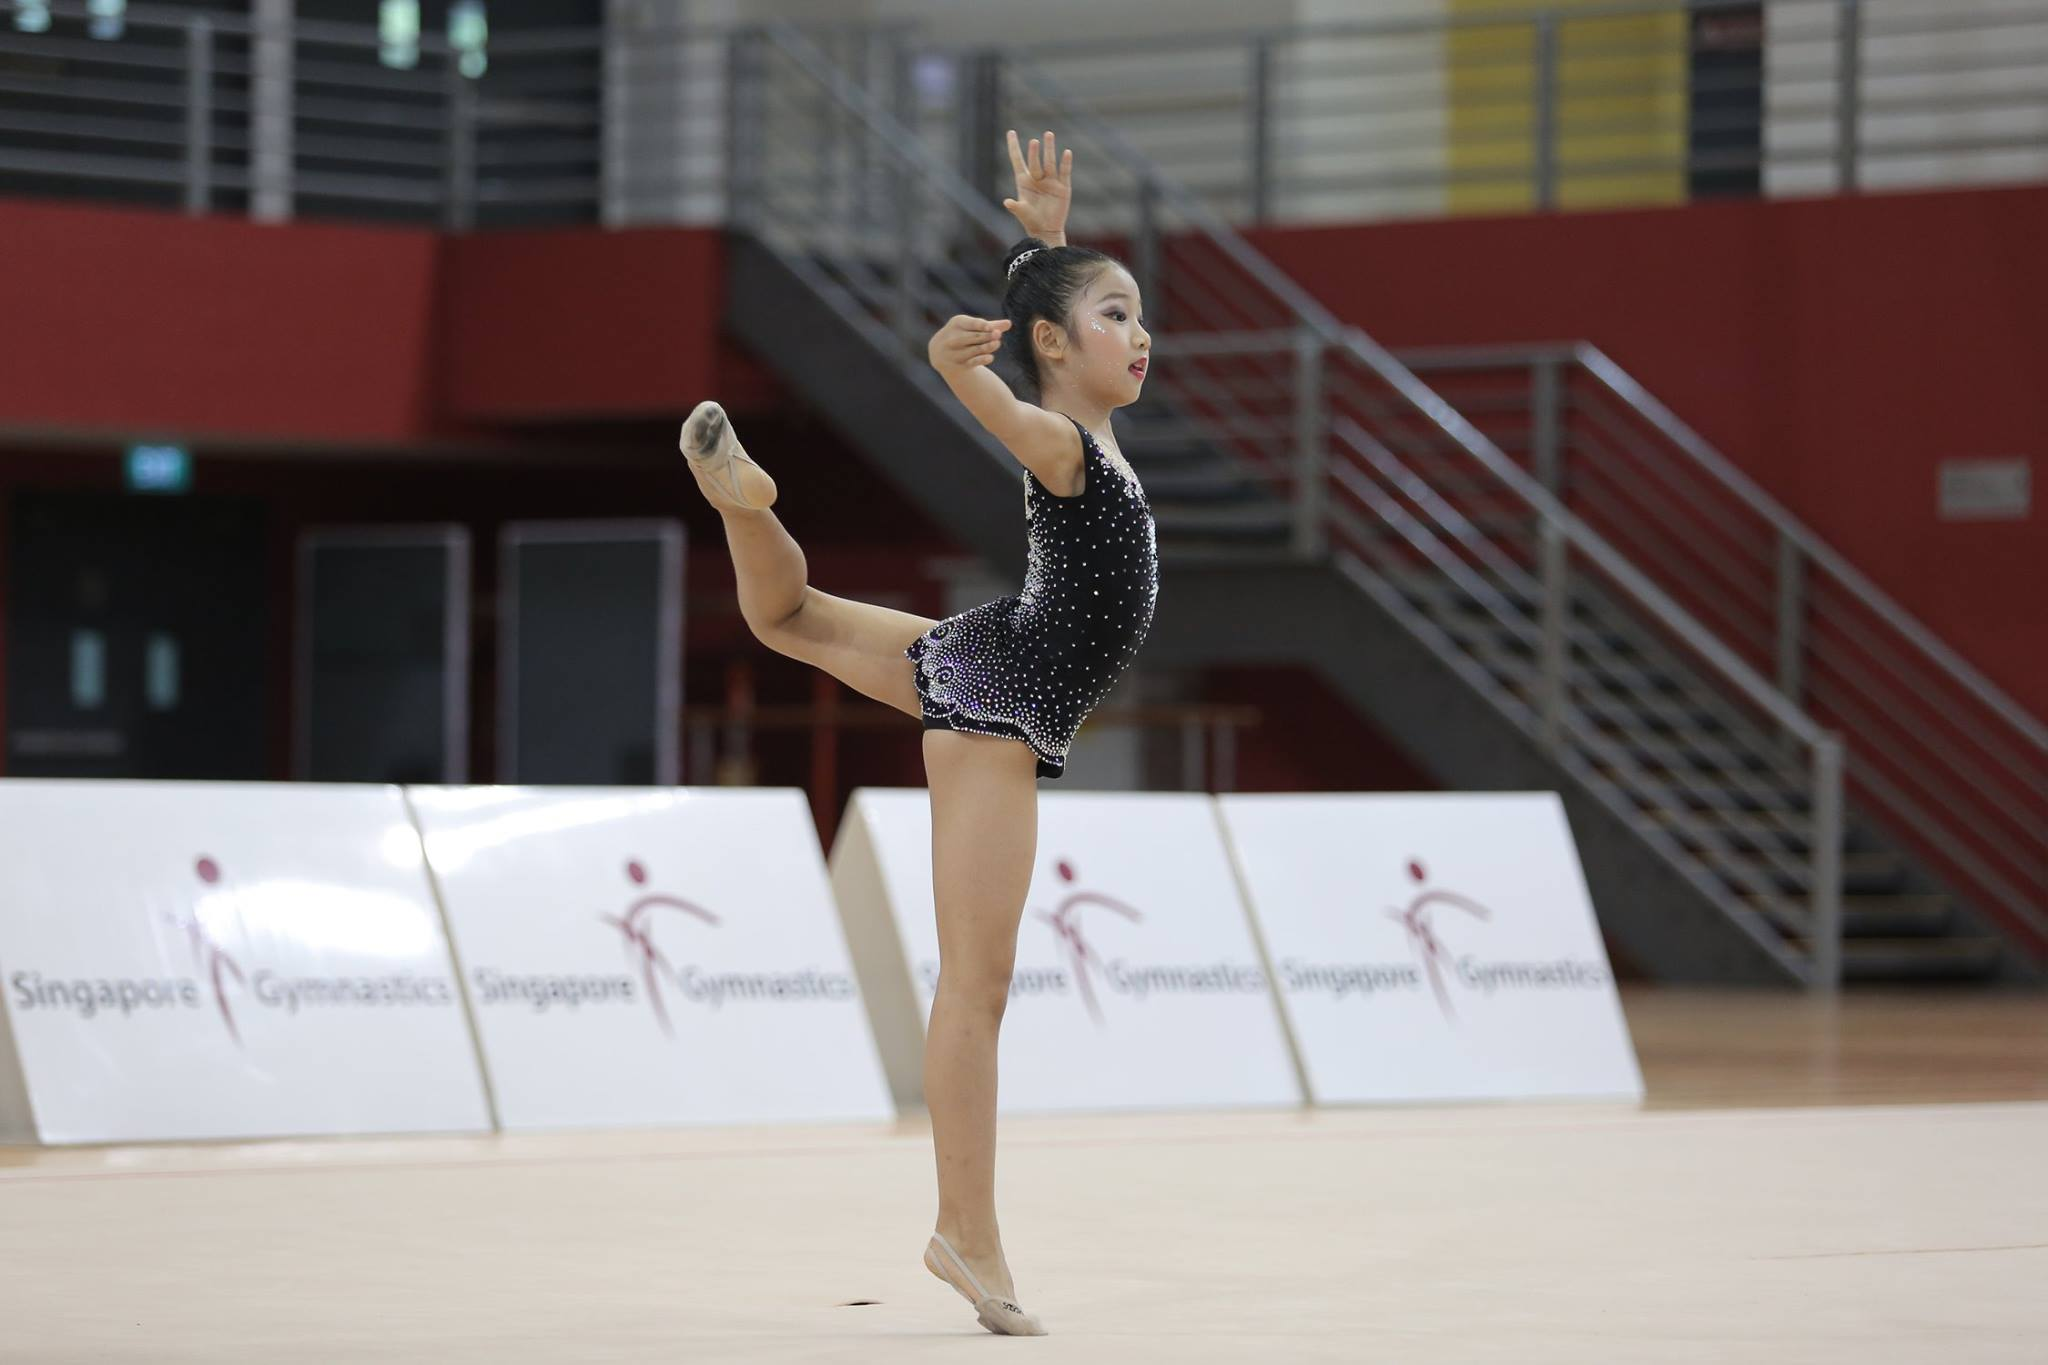 Singapore Gymnastics Open Championships 2017 80